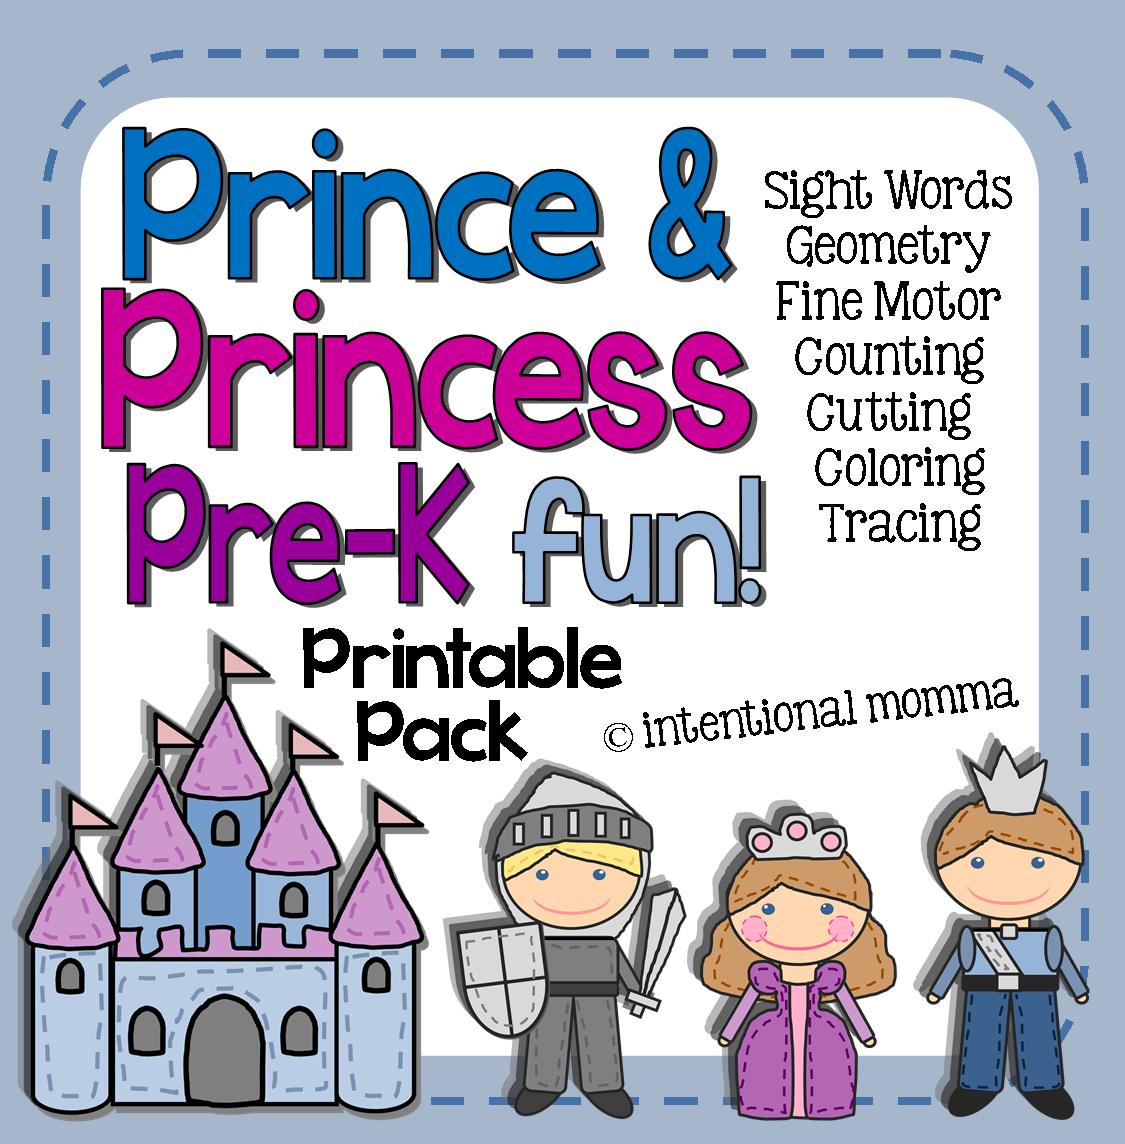 worksheets fairytale unit preschool kindergarten math sight words literacy knight castle